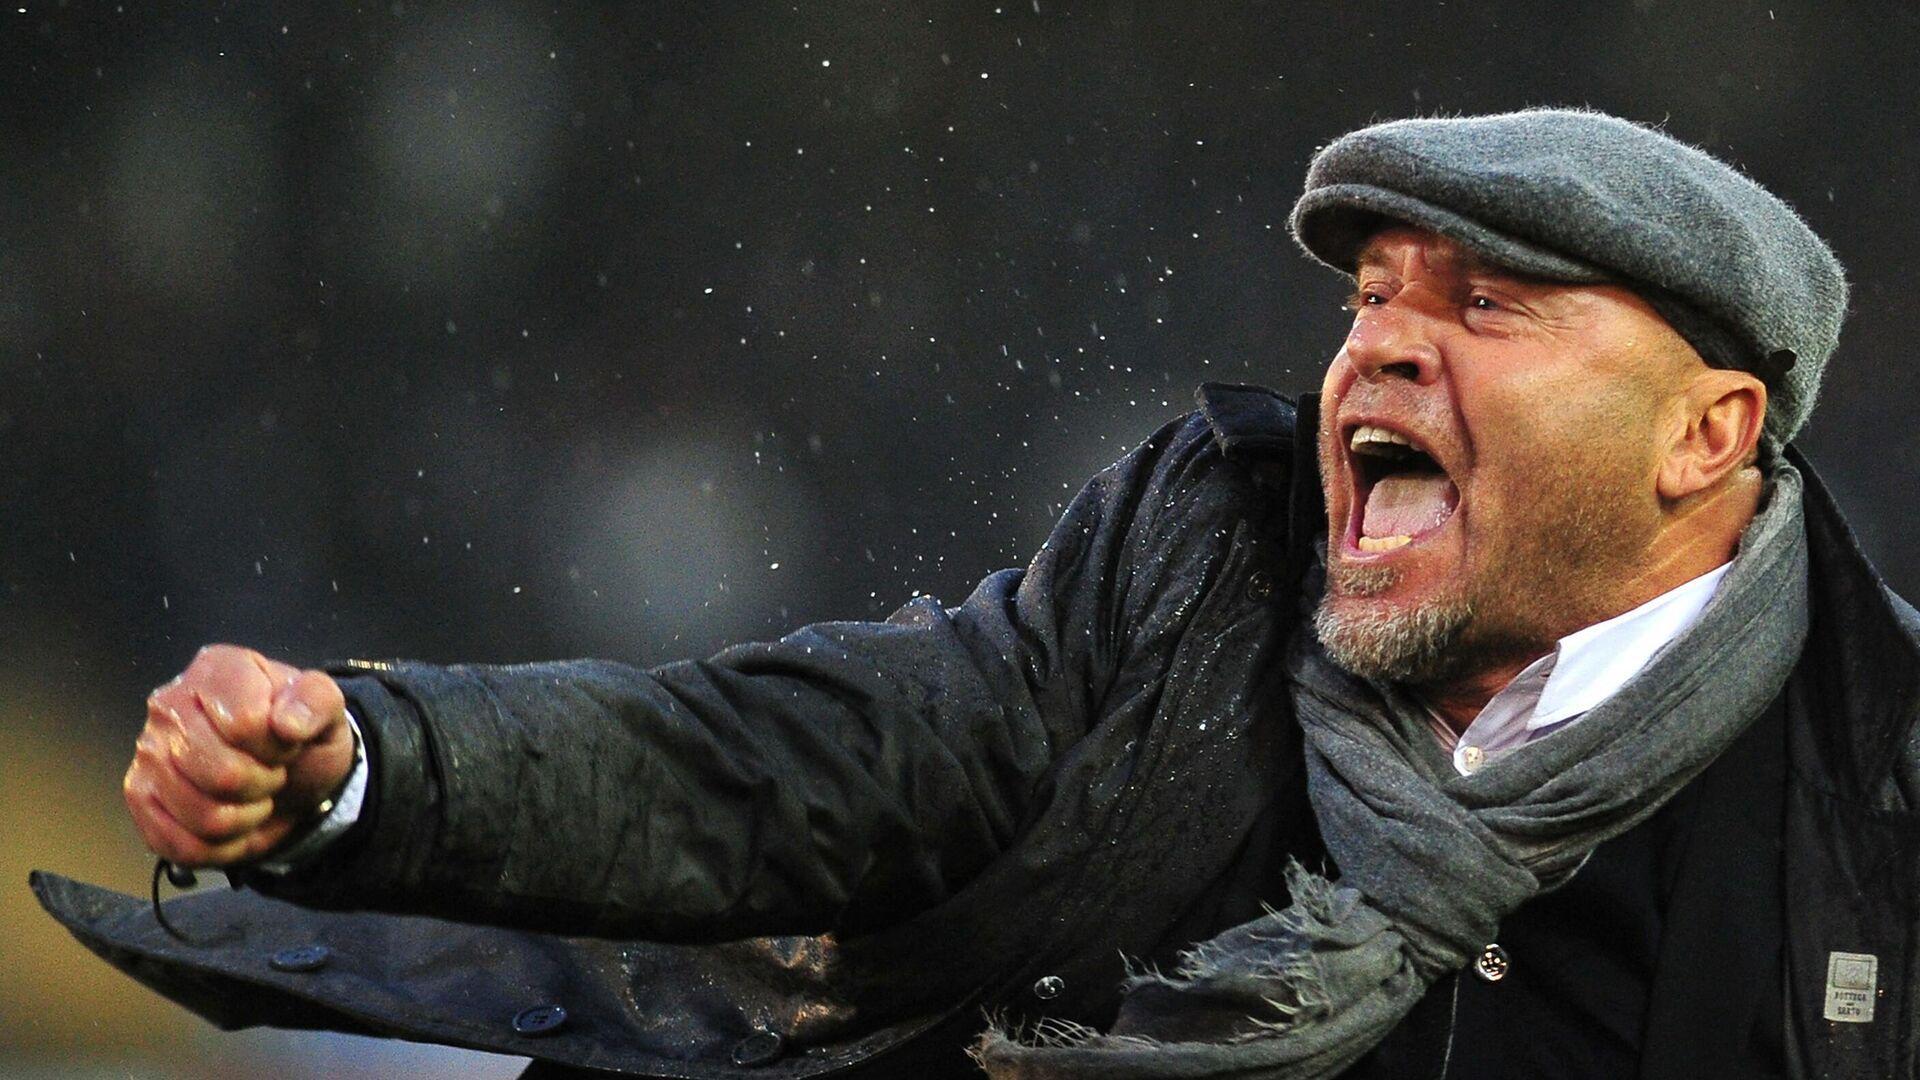 Lecce's coach Serse Cosmi celebrates at the end of the italian serie A football match Lecce vs InterMilan at Via del Mare stadium in Lecce on January 29, 2012. Lecce won the match 1-0.  AFP PHOTO / ALBERTO PIZZOLI (Photo by ALBERTO PIZZOLI / AFP) - РИА Новости, 1920, 02.03.2021